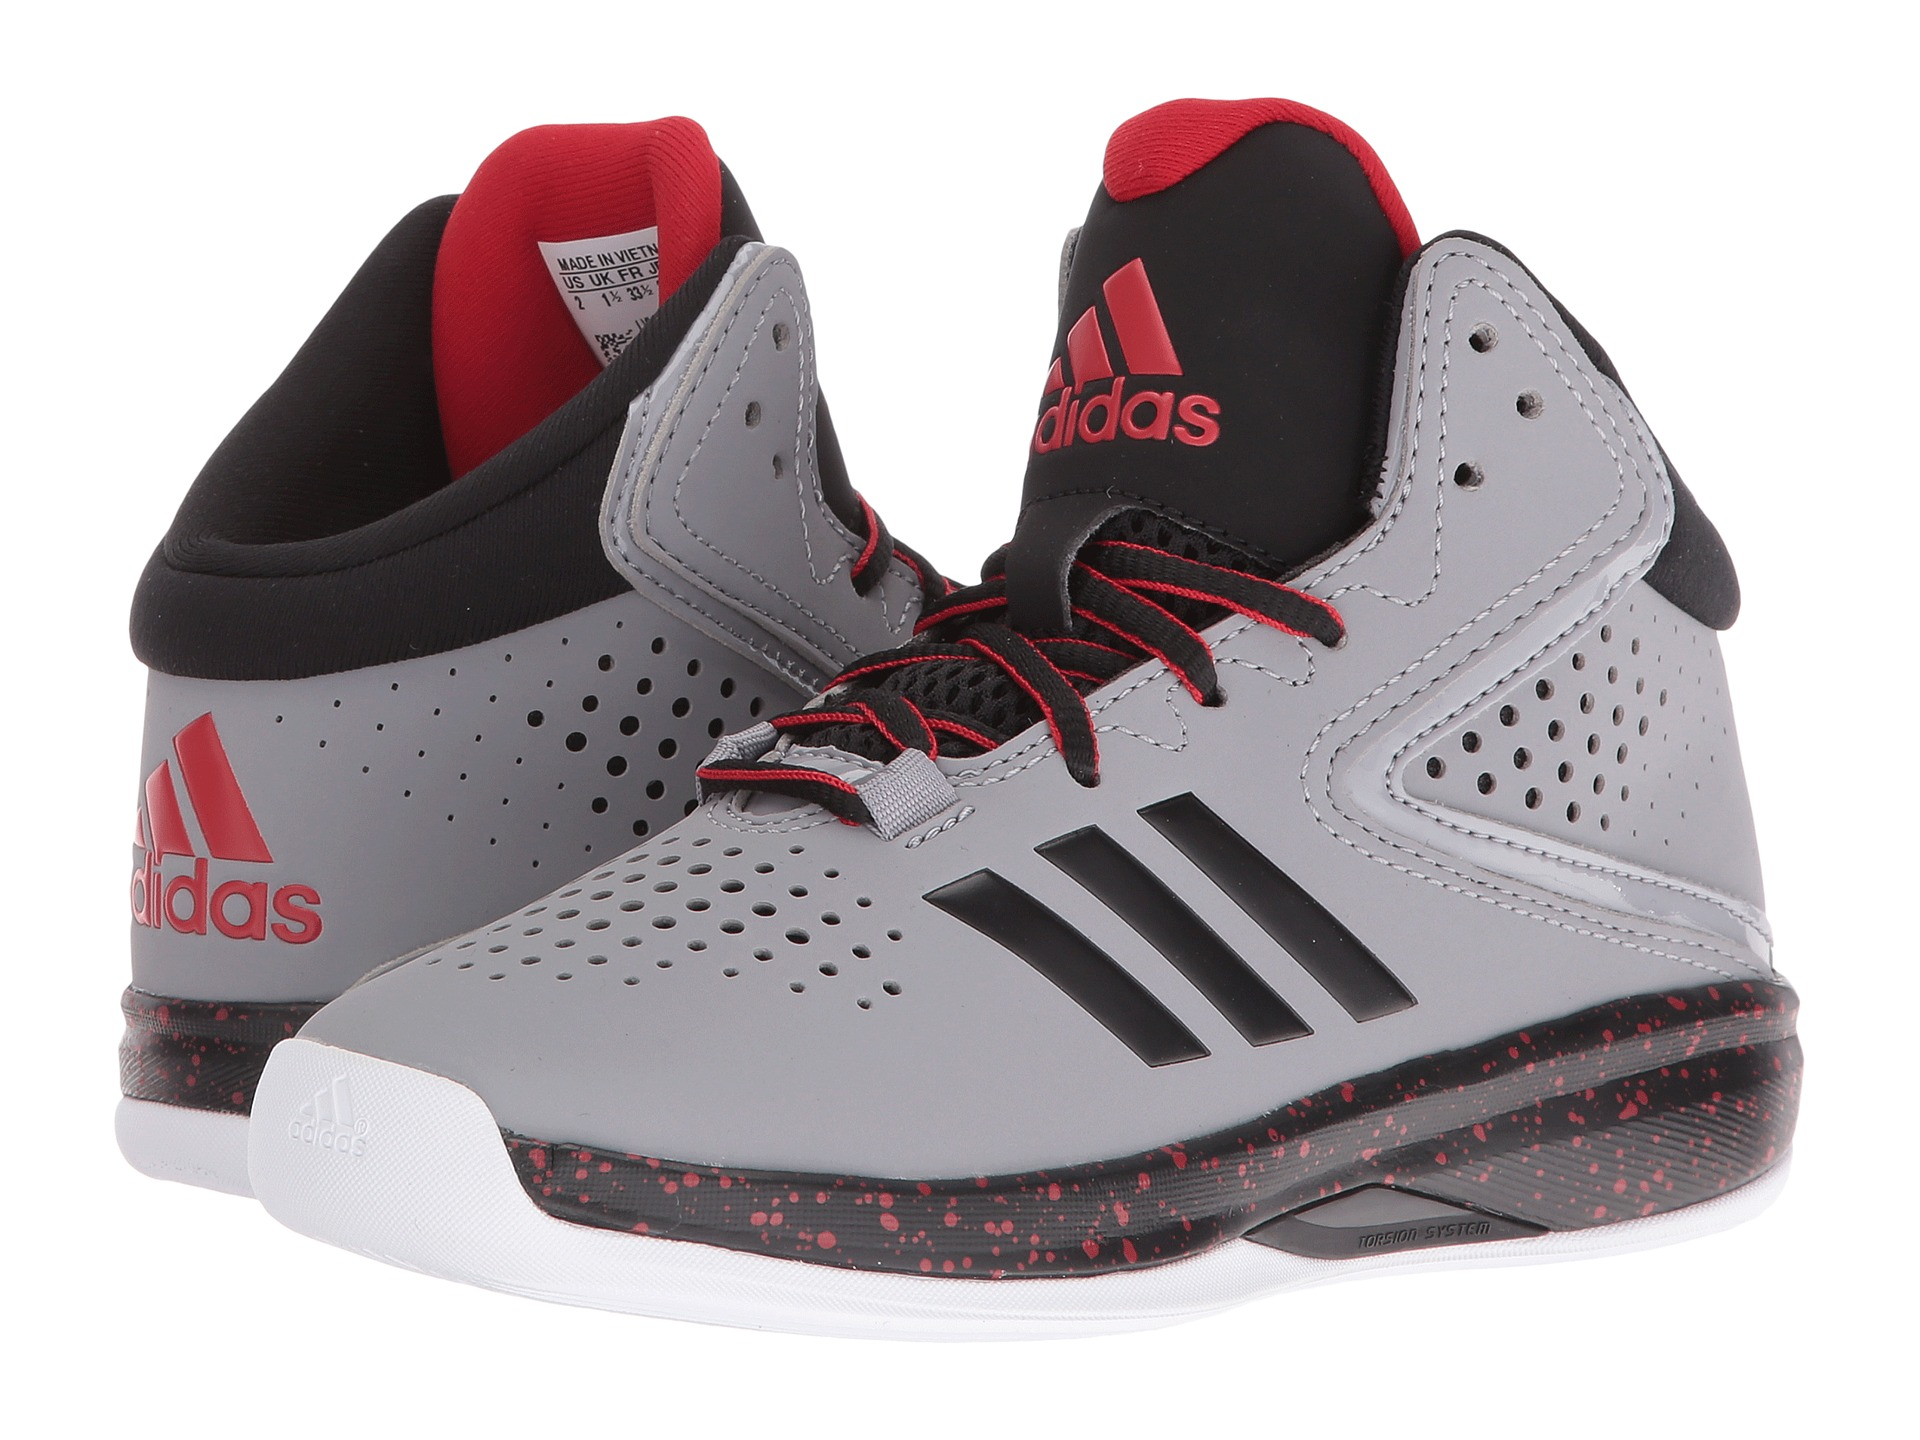 Little Kid Basketball Sneakers